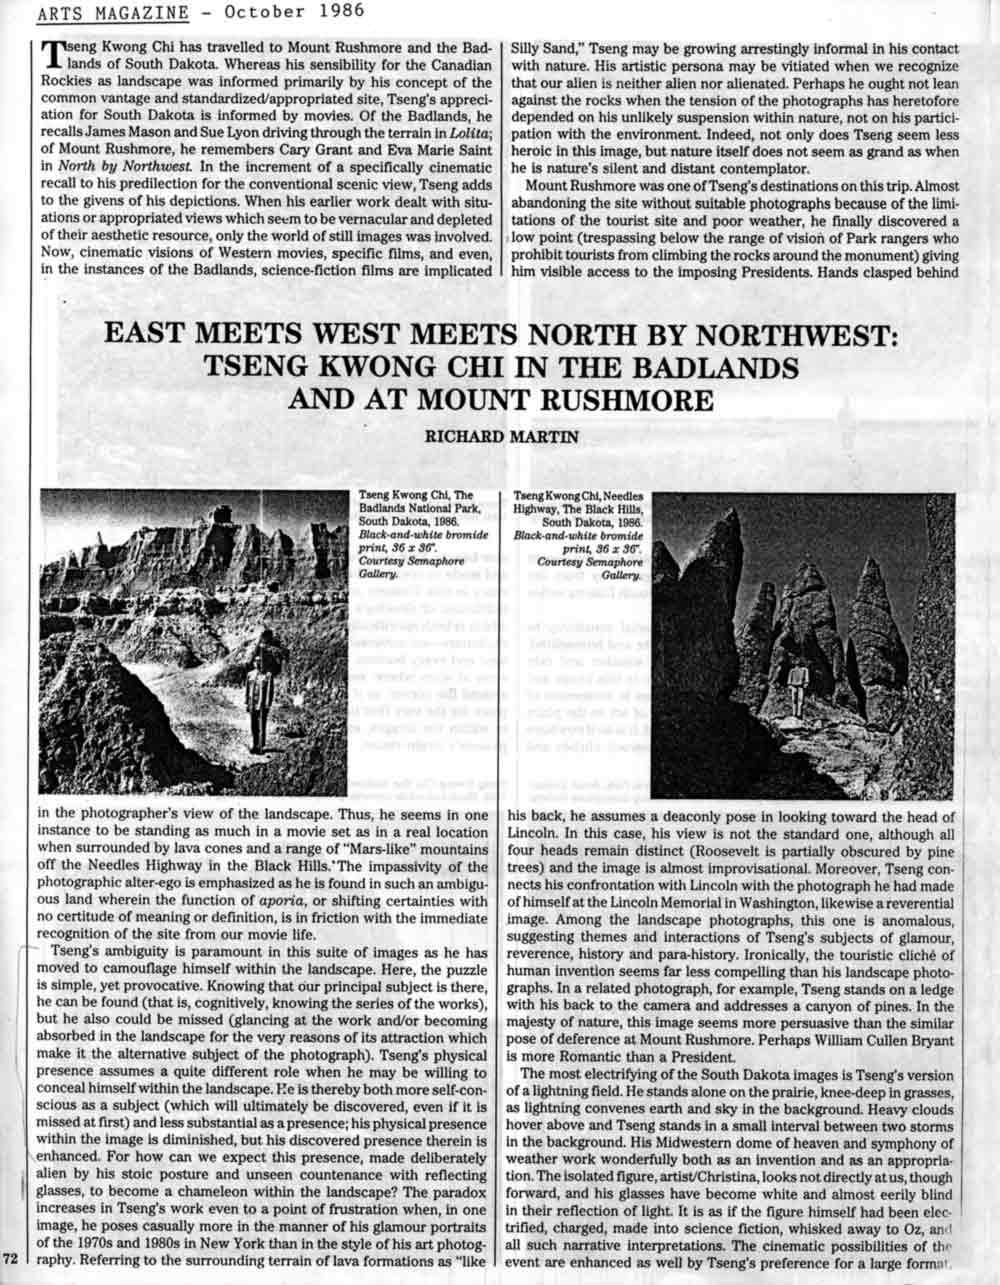 East Meets West, pg 1